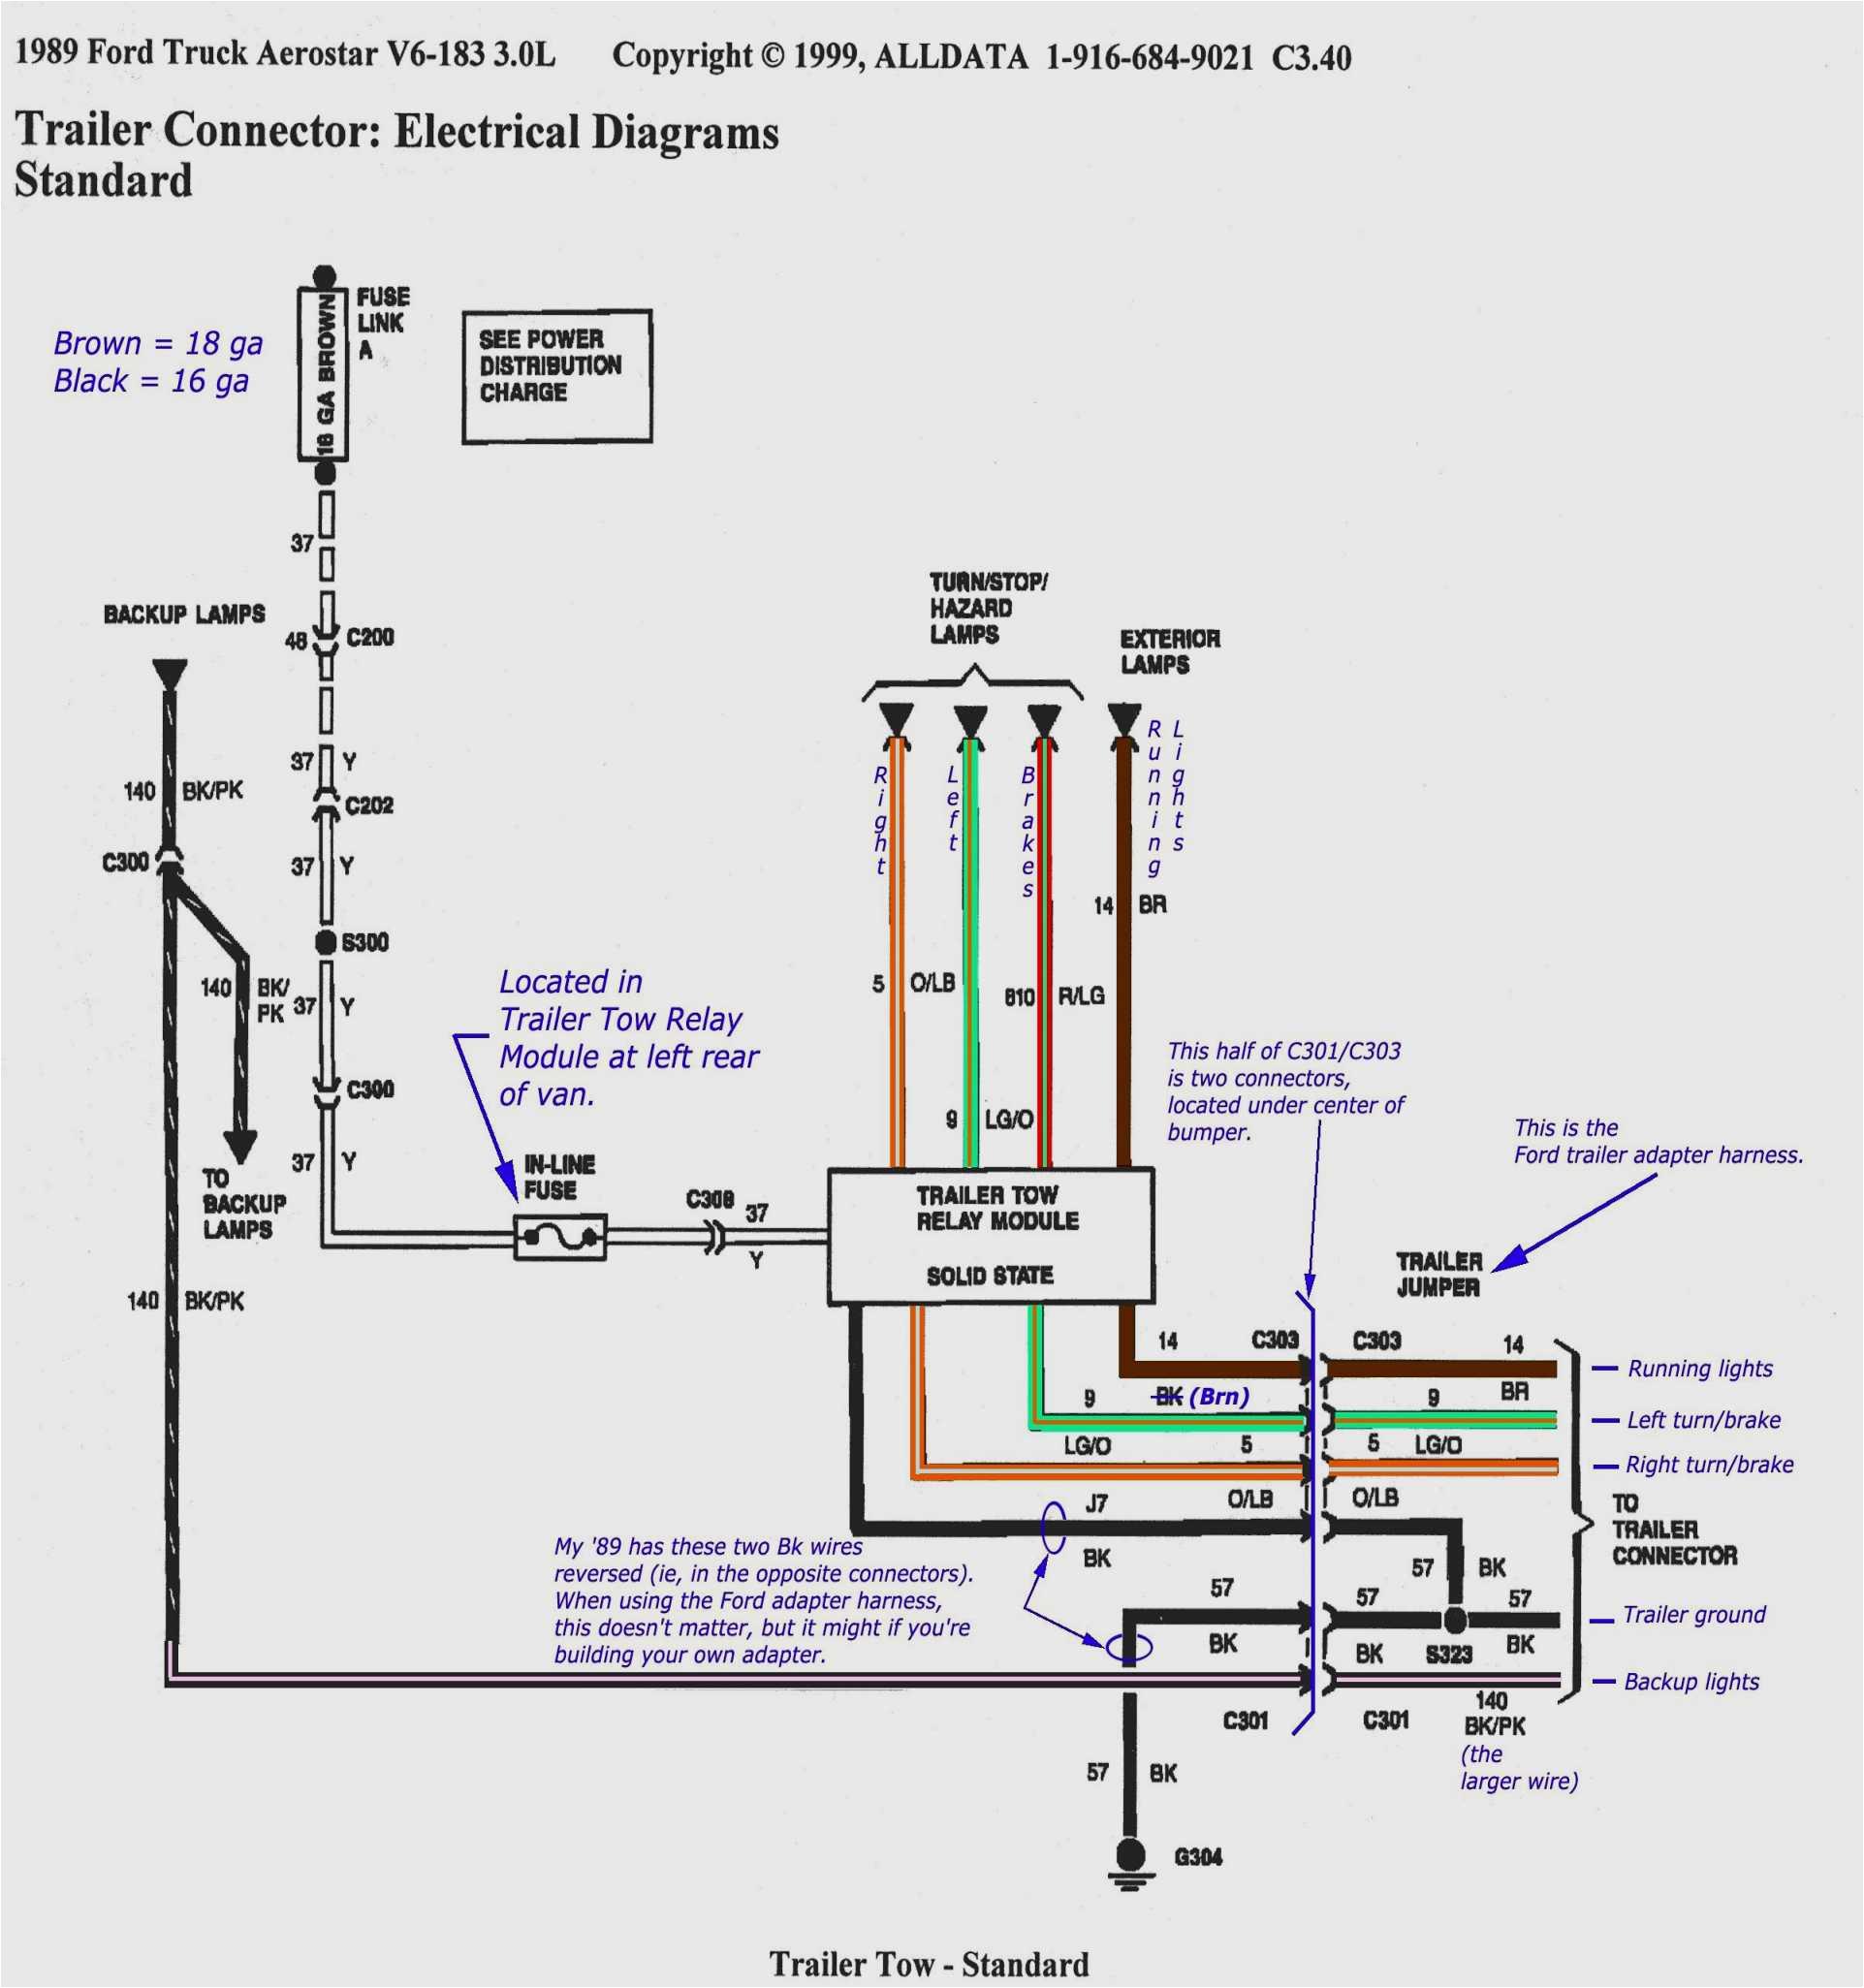 ford fusion radio wiring diagram wiring diagramsford fusion radio wiring diagram 2002 ford ranger stereo wiring